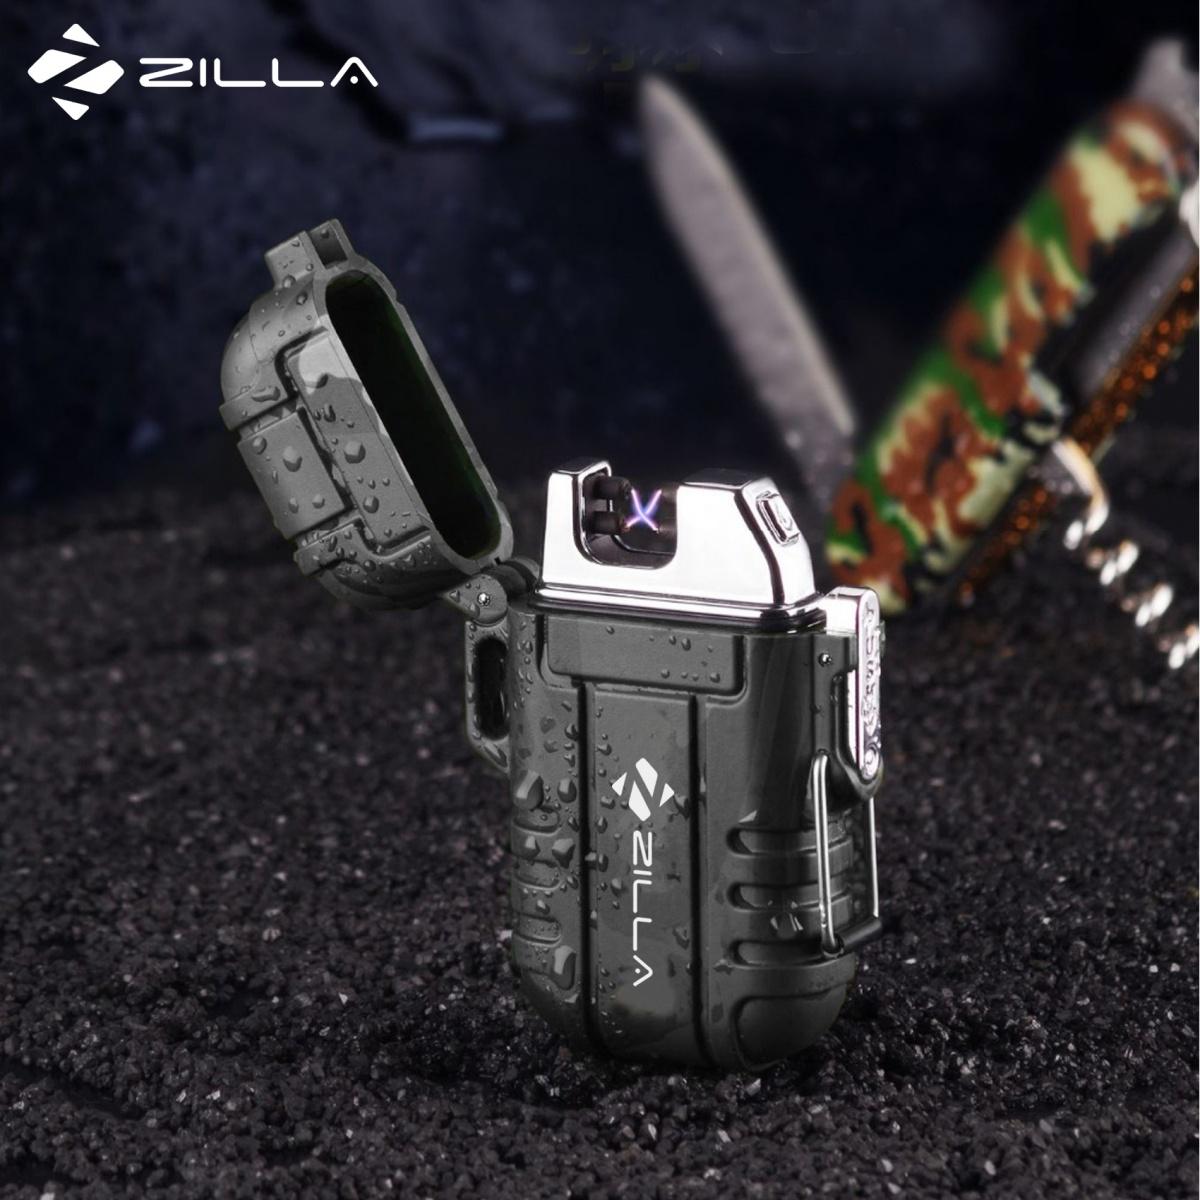 Zilla Dual Arc Micro USB Rechargeable Electric Cigarette Lighter - Black